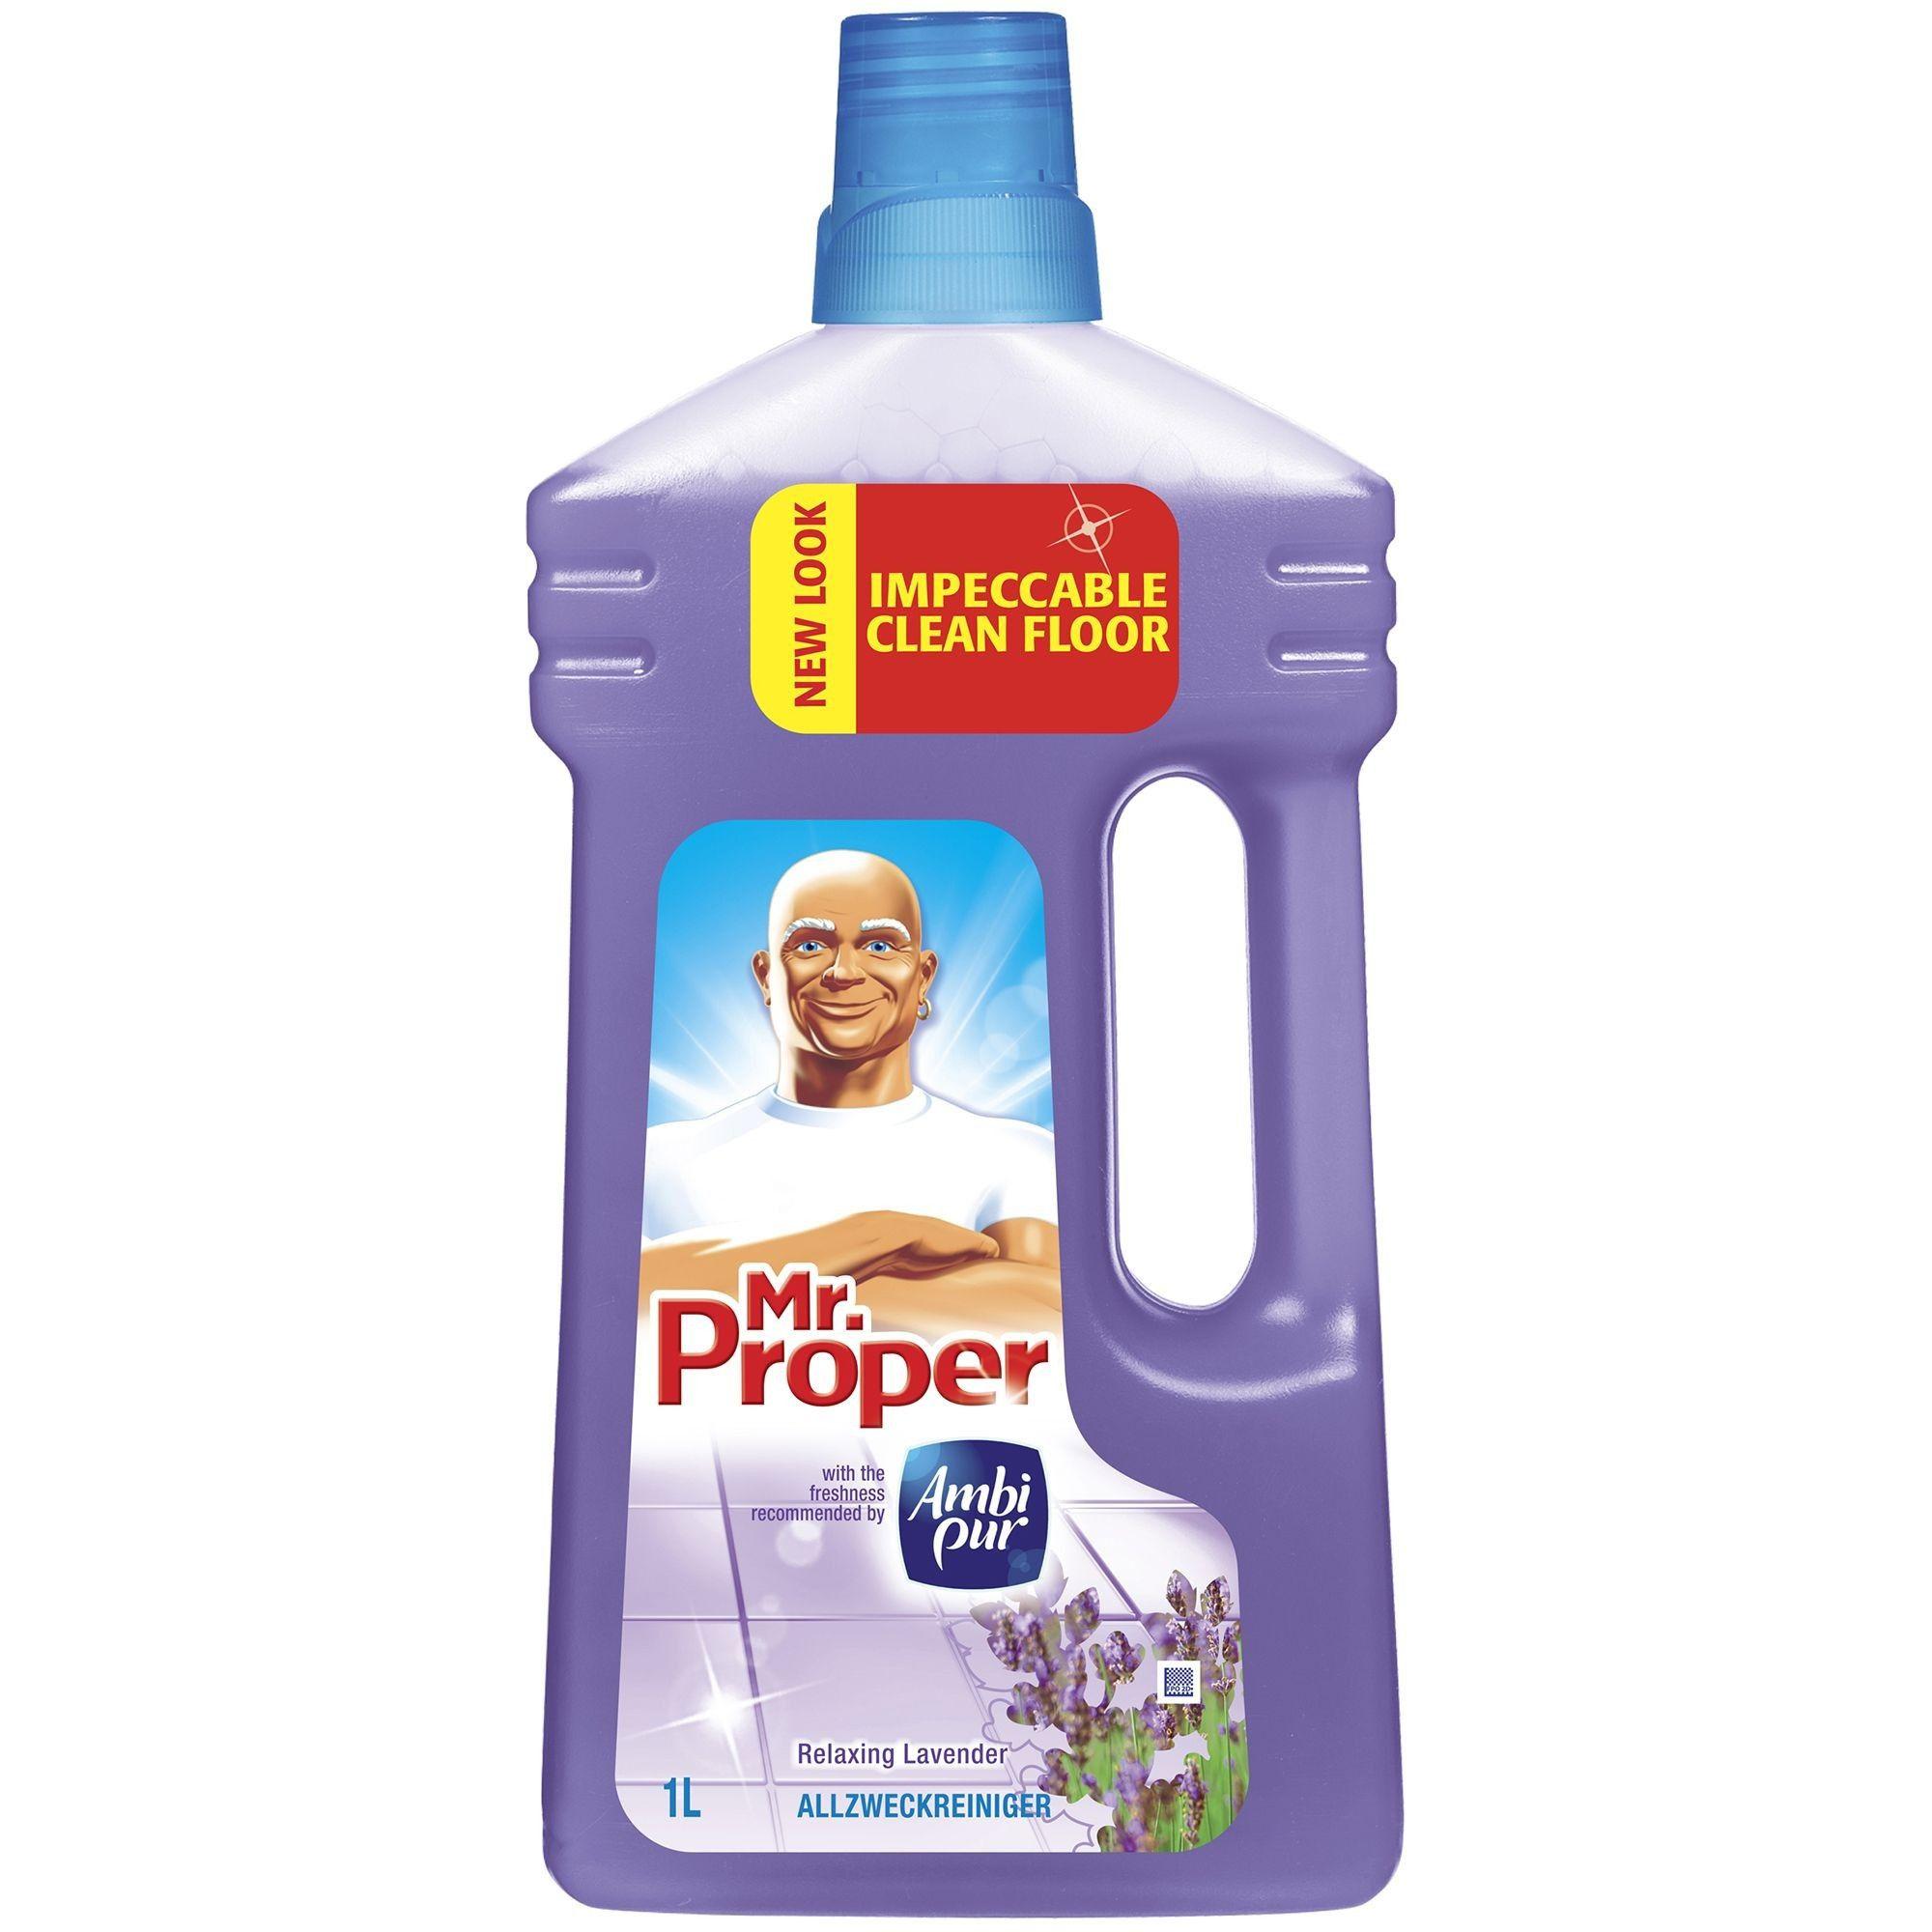 Mr. Proper Levander čistiaci prostriedok na podlahy 1l